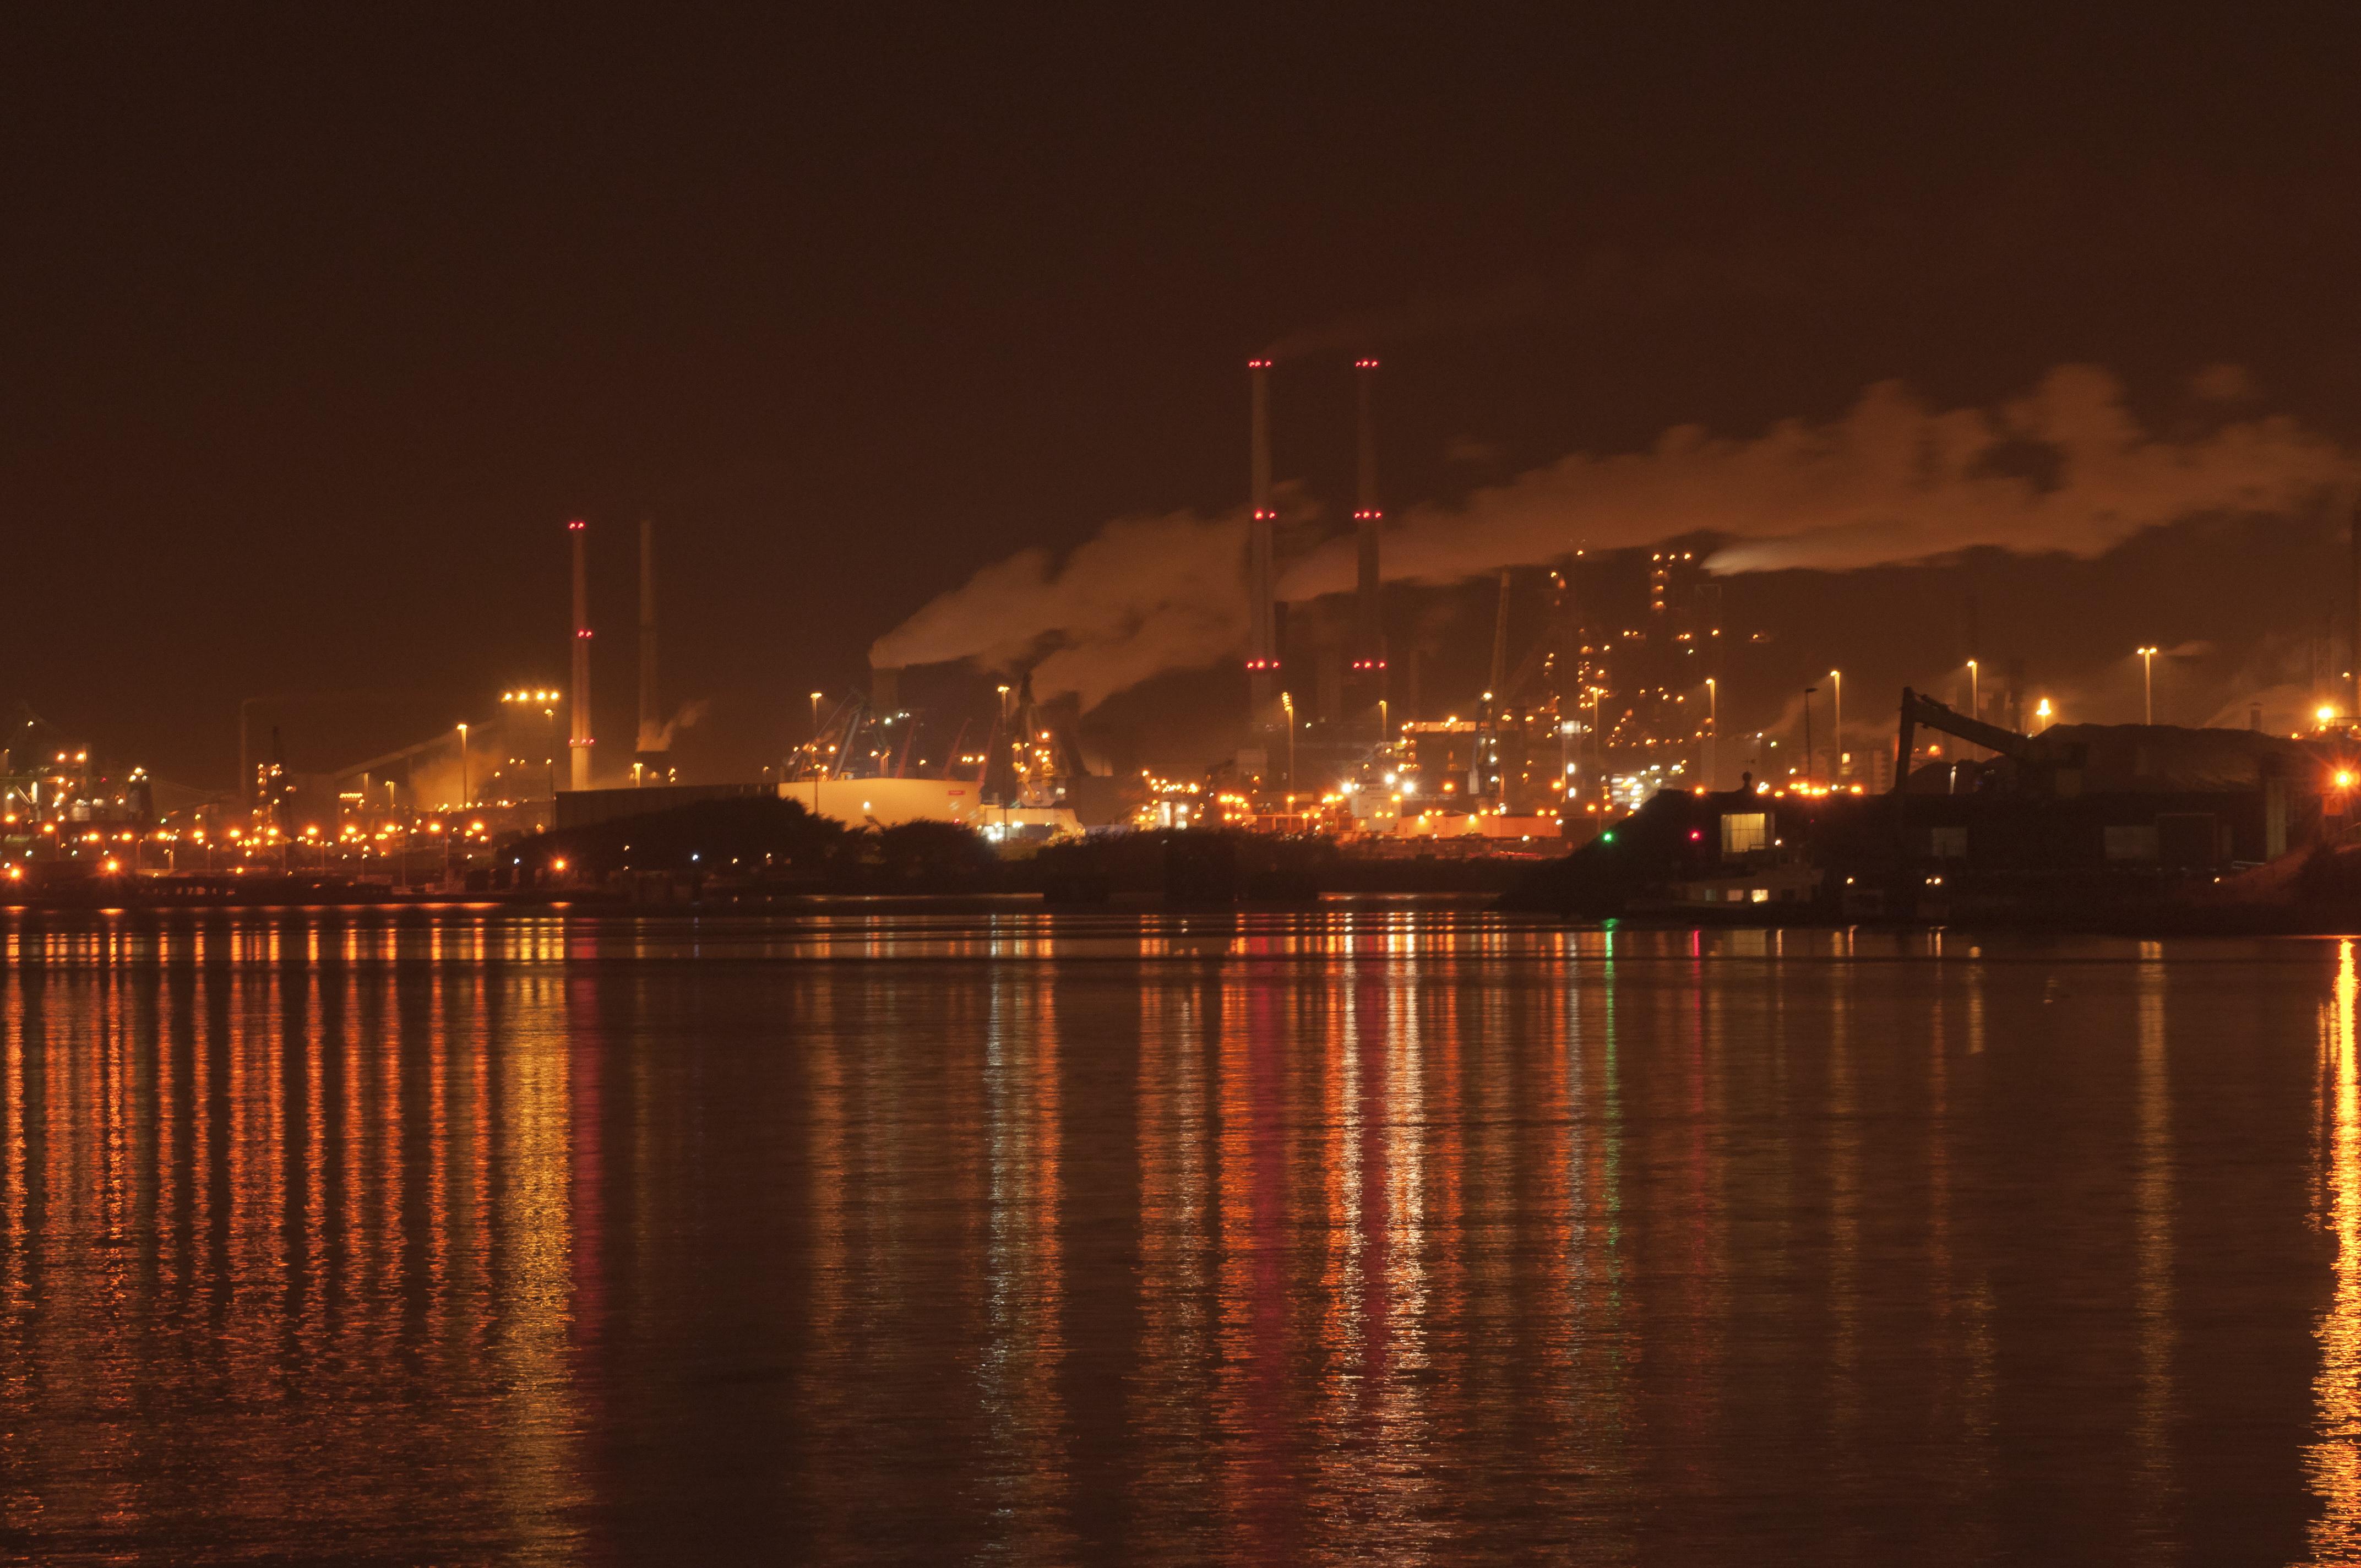 Tata Steel - Simple English Wikipedia, the free encyclopedia